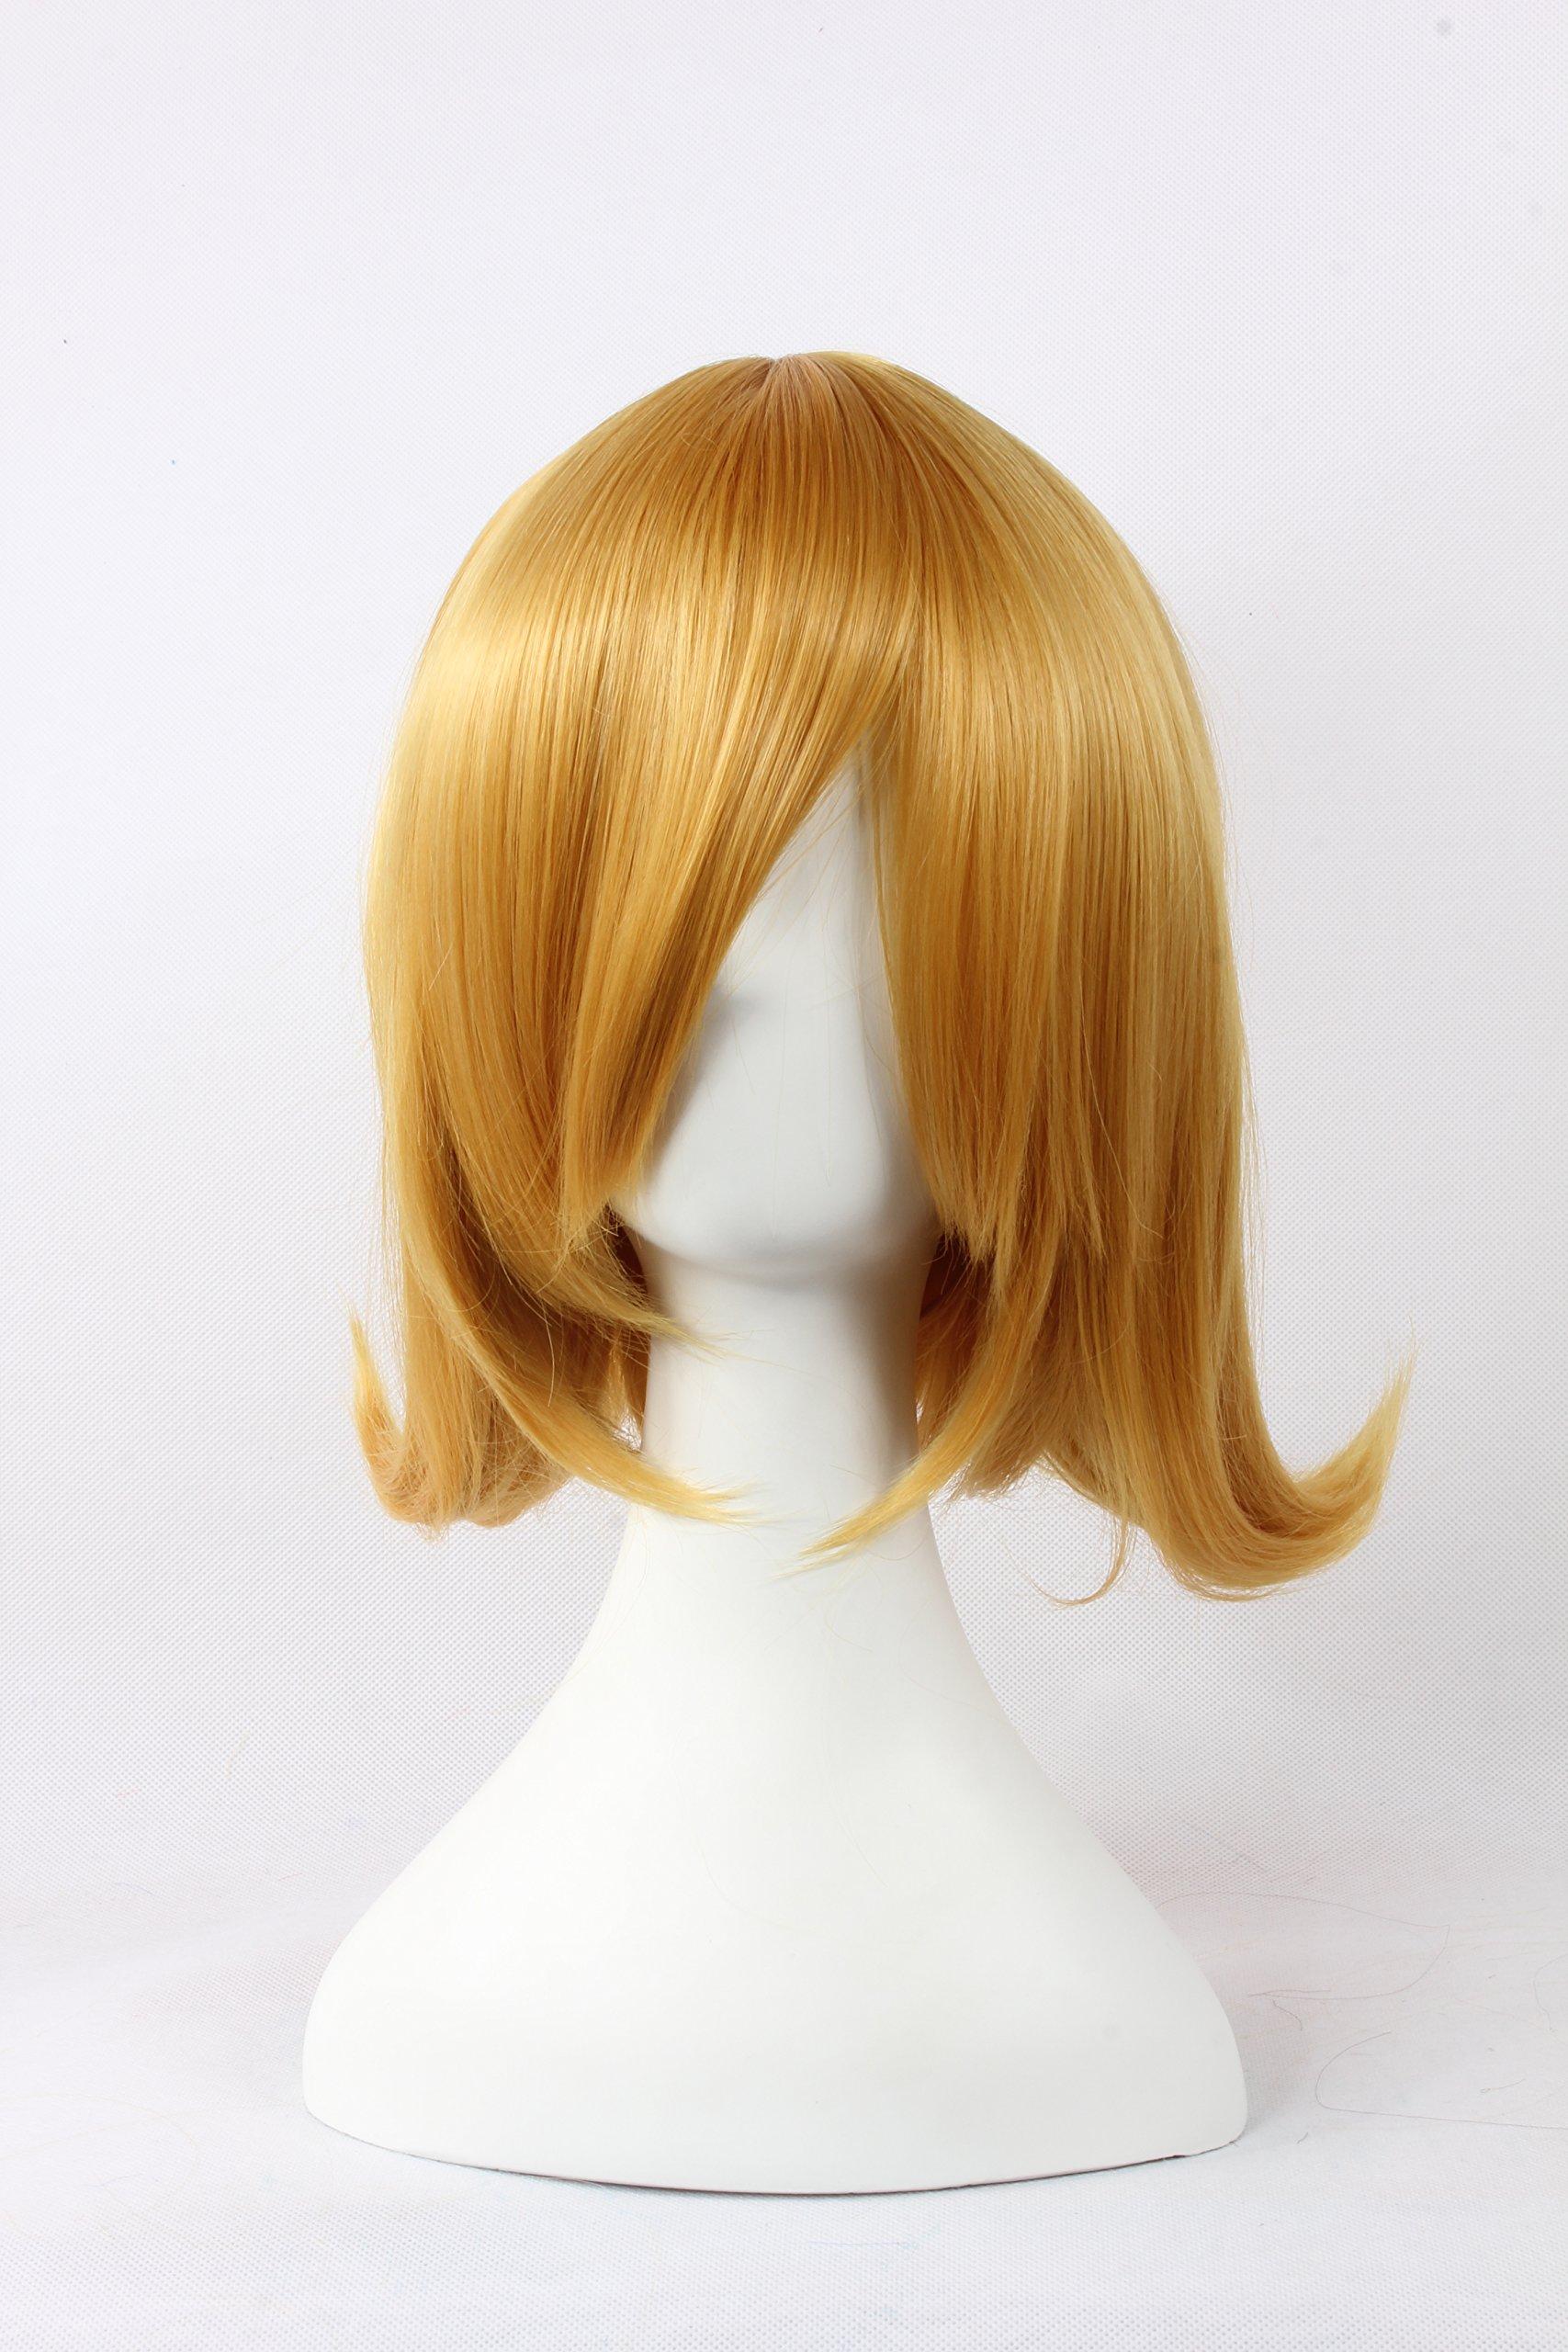 Coolsky Wigs Vocaloid Series Mix Golden Medium Hair Cosplay Wig